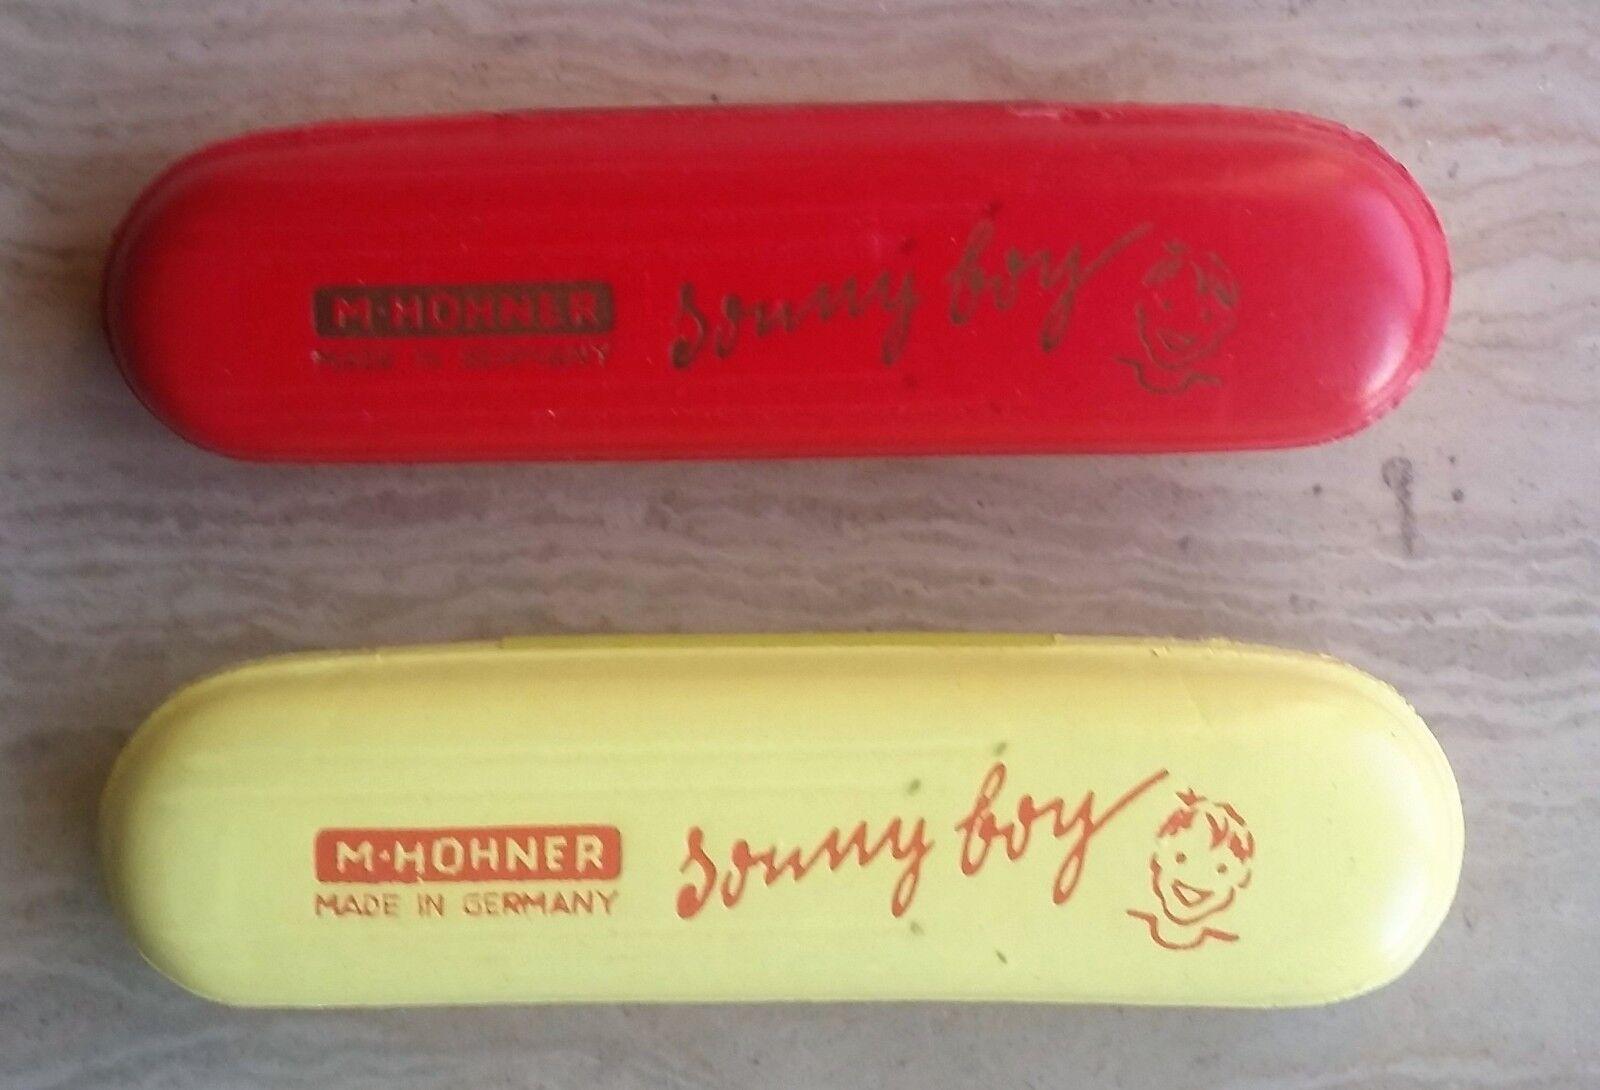 2 Armonica Hohner Vintage Sonny Boy 32V Anni50 - Set di 2 NUOVE - rot e Gelb